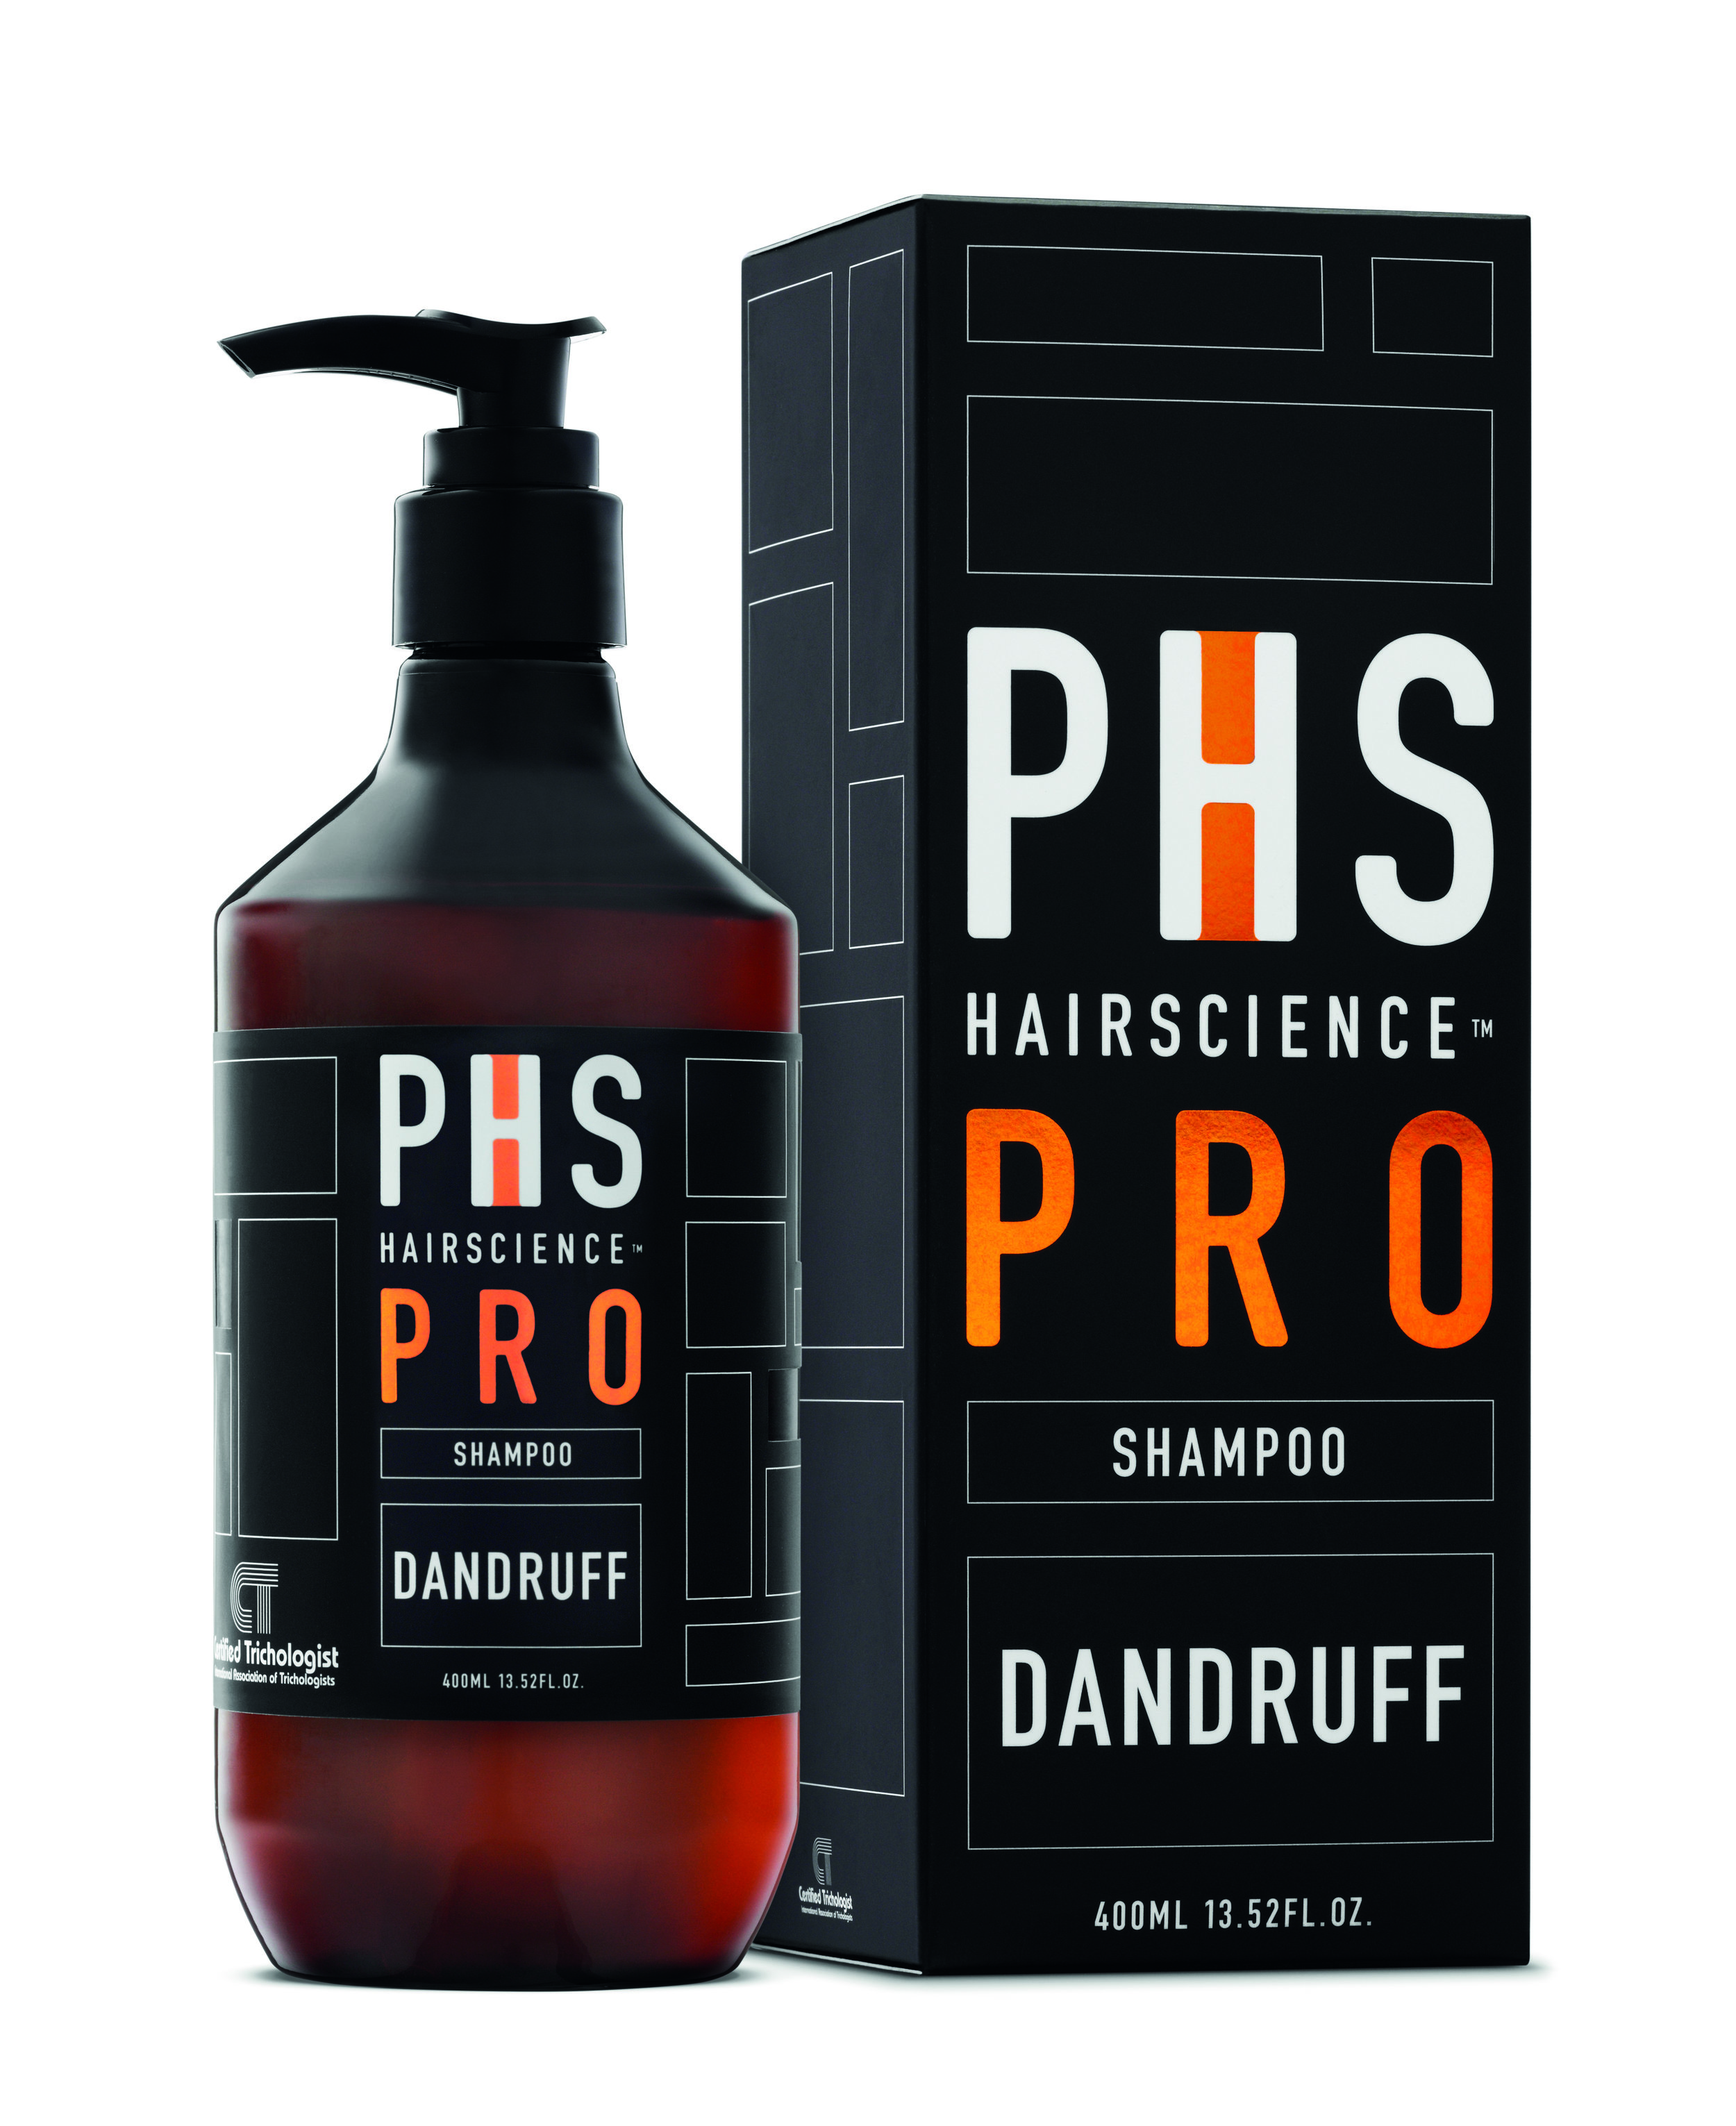 PHS 01 Packaging PRO Shampoo.jpg